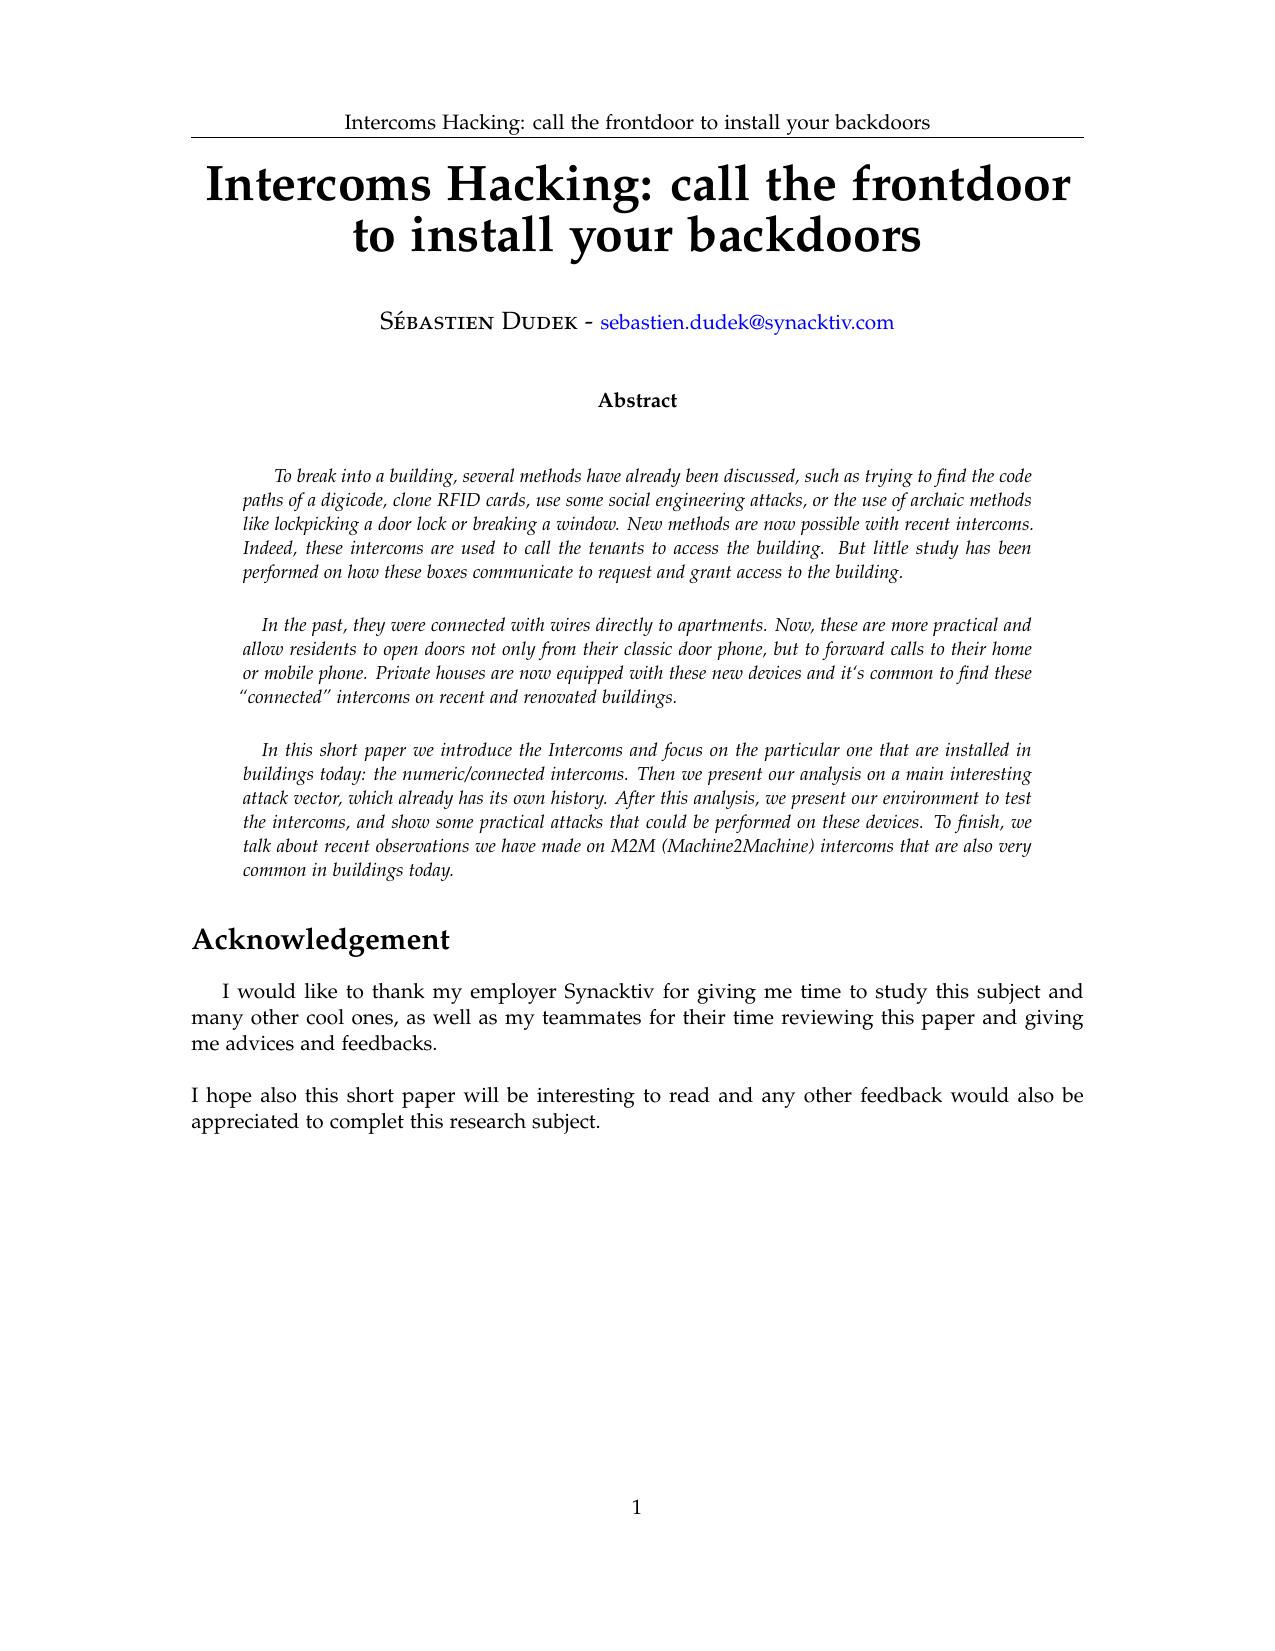 Intercoms Hacking - Schedule 33  Chaos Communication